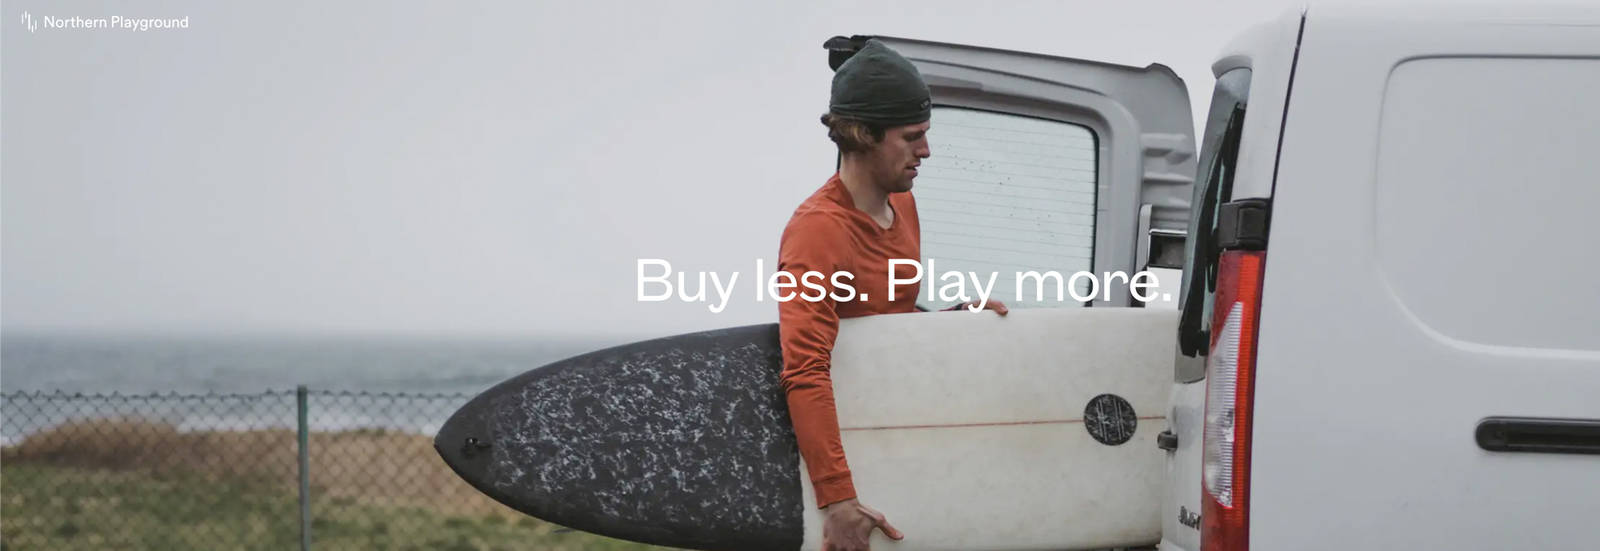 Norske Northern Playground har lagt seg på samme linje som Patagonia, samtidig som de har laget en form for livstidsgaranti på produktene sine.